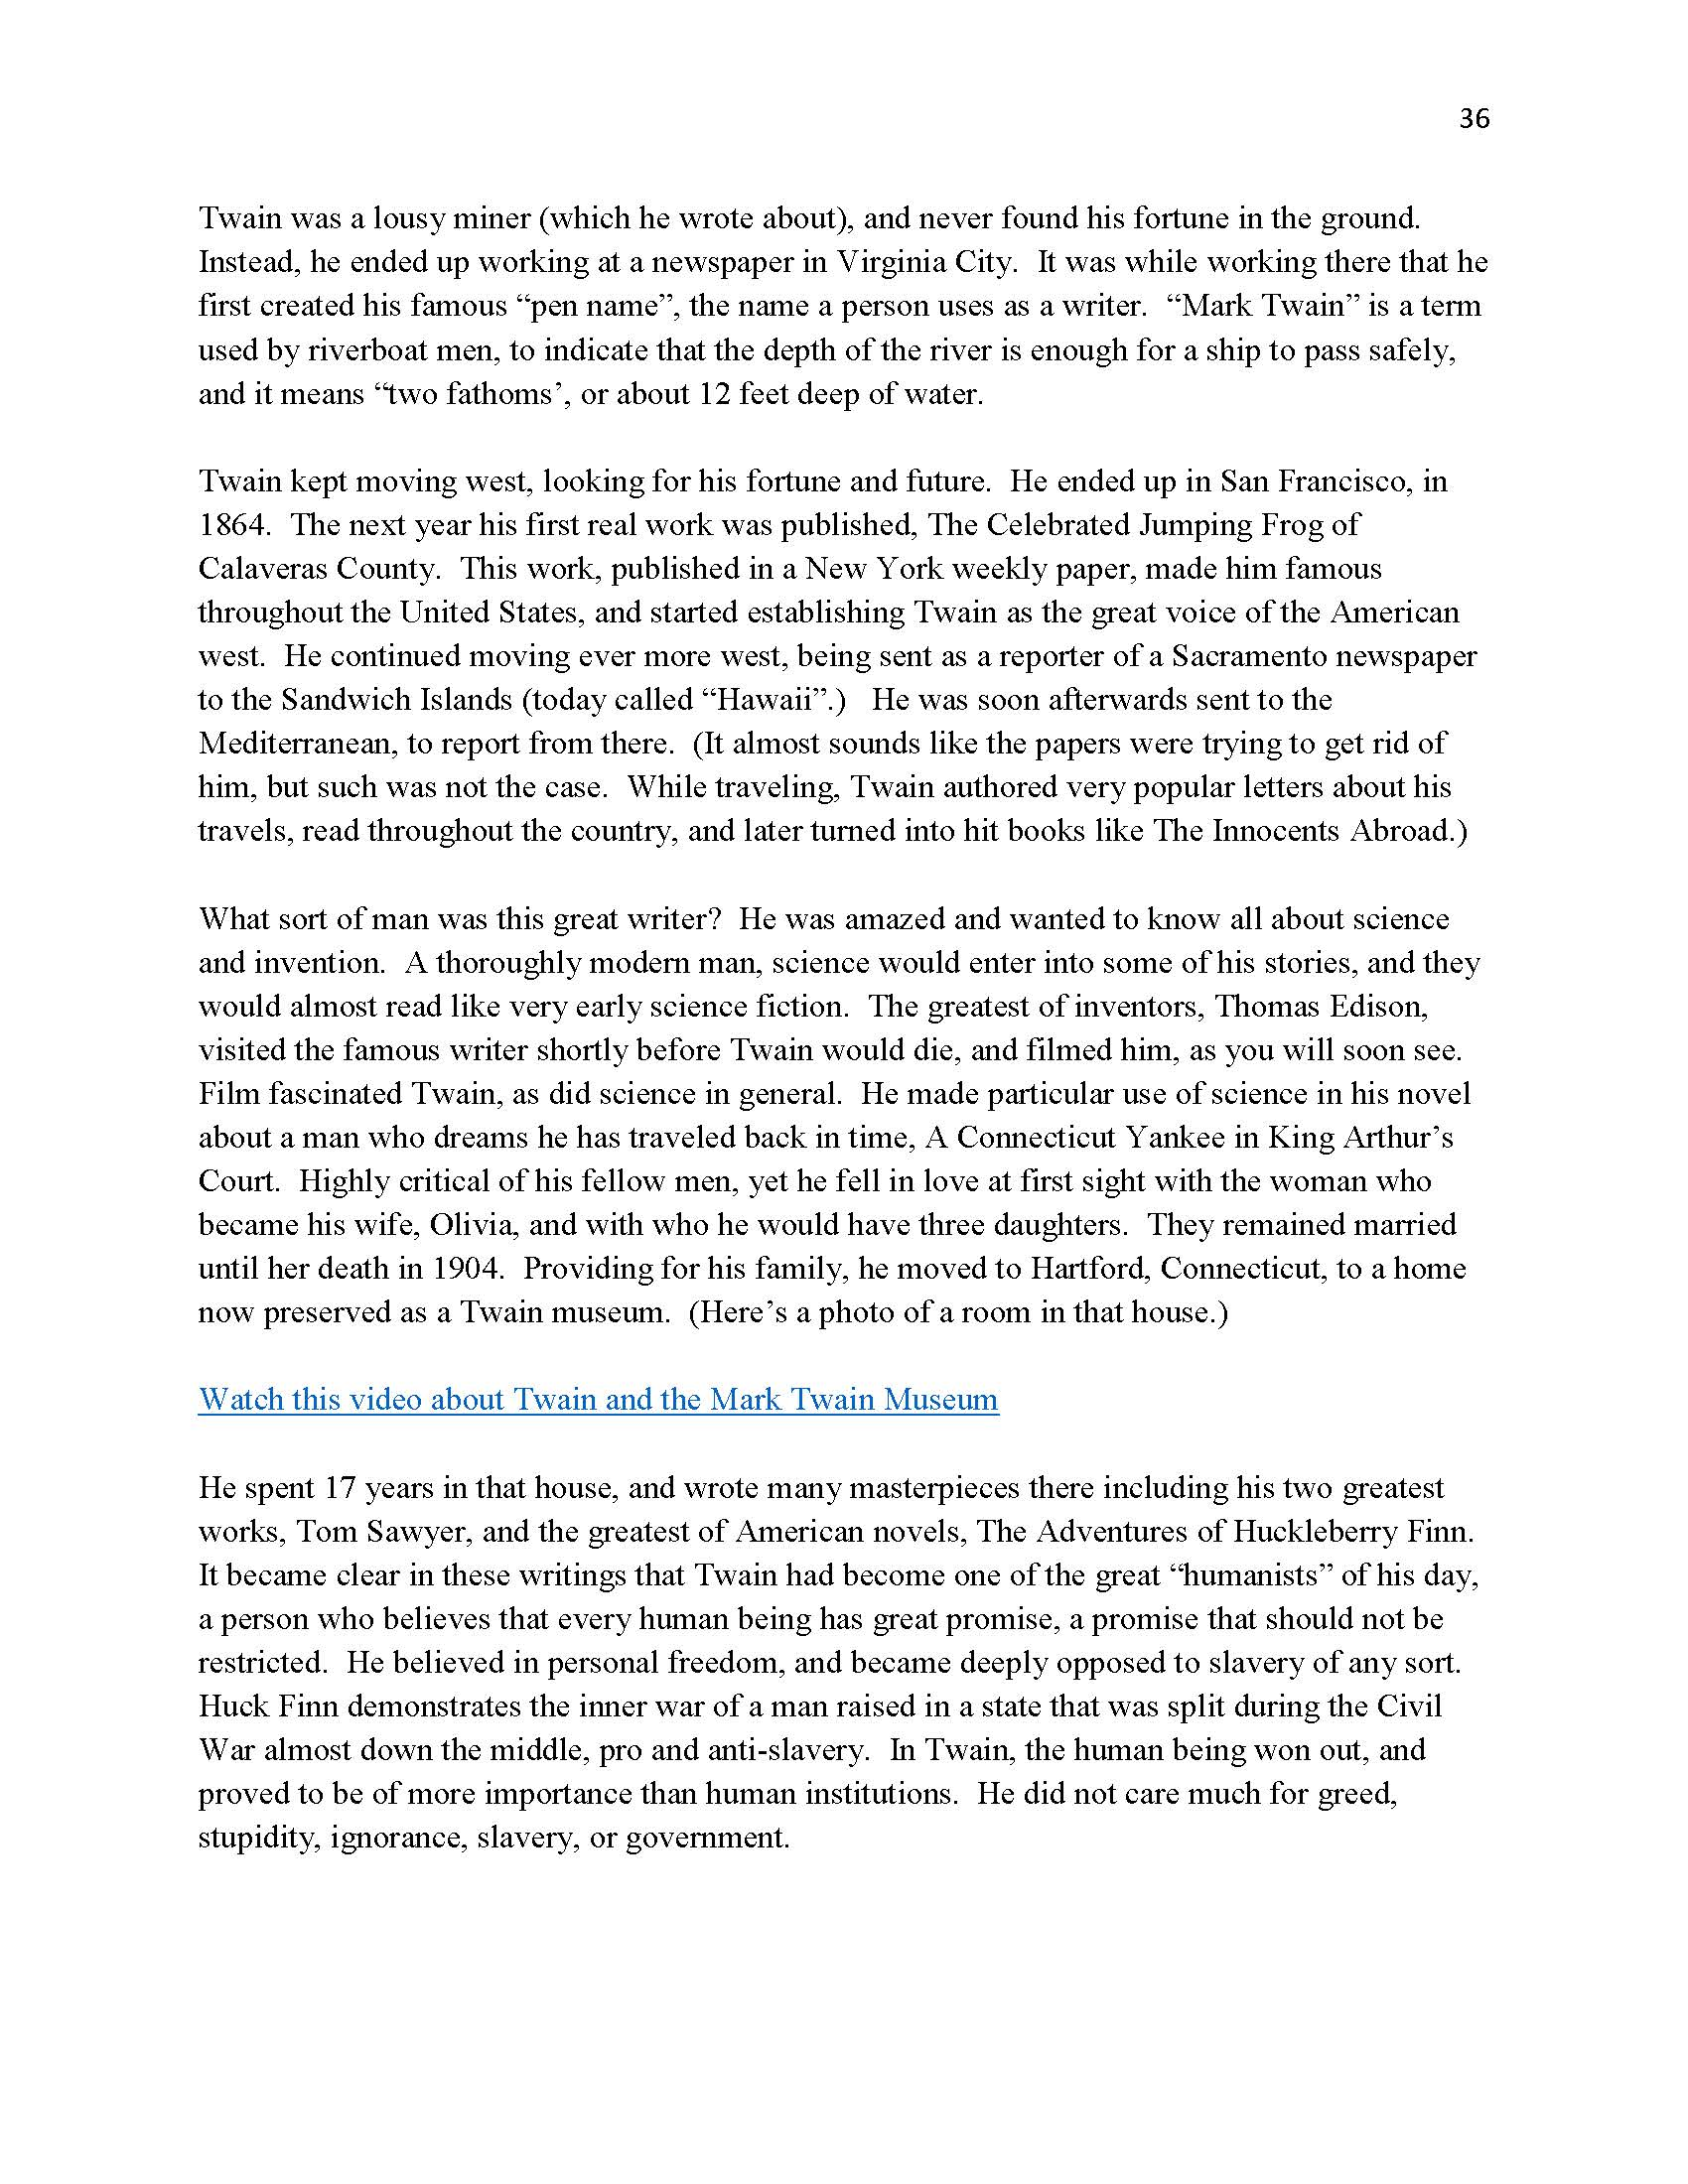 Step 3-4 Literature Guide - Mark Twain Short Stories_Page_037.jpg